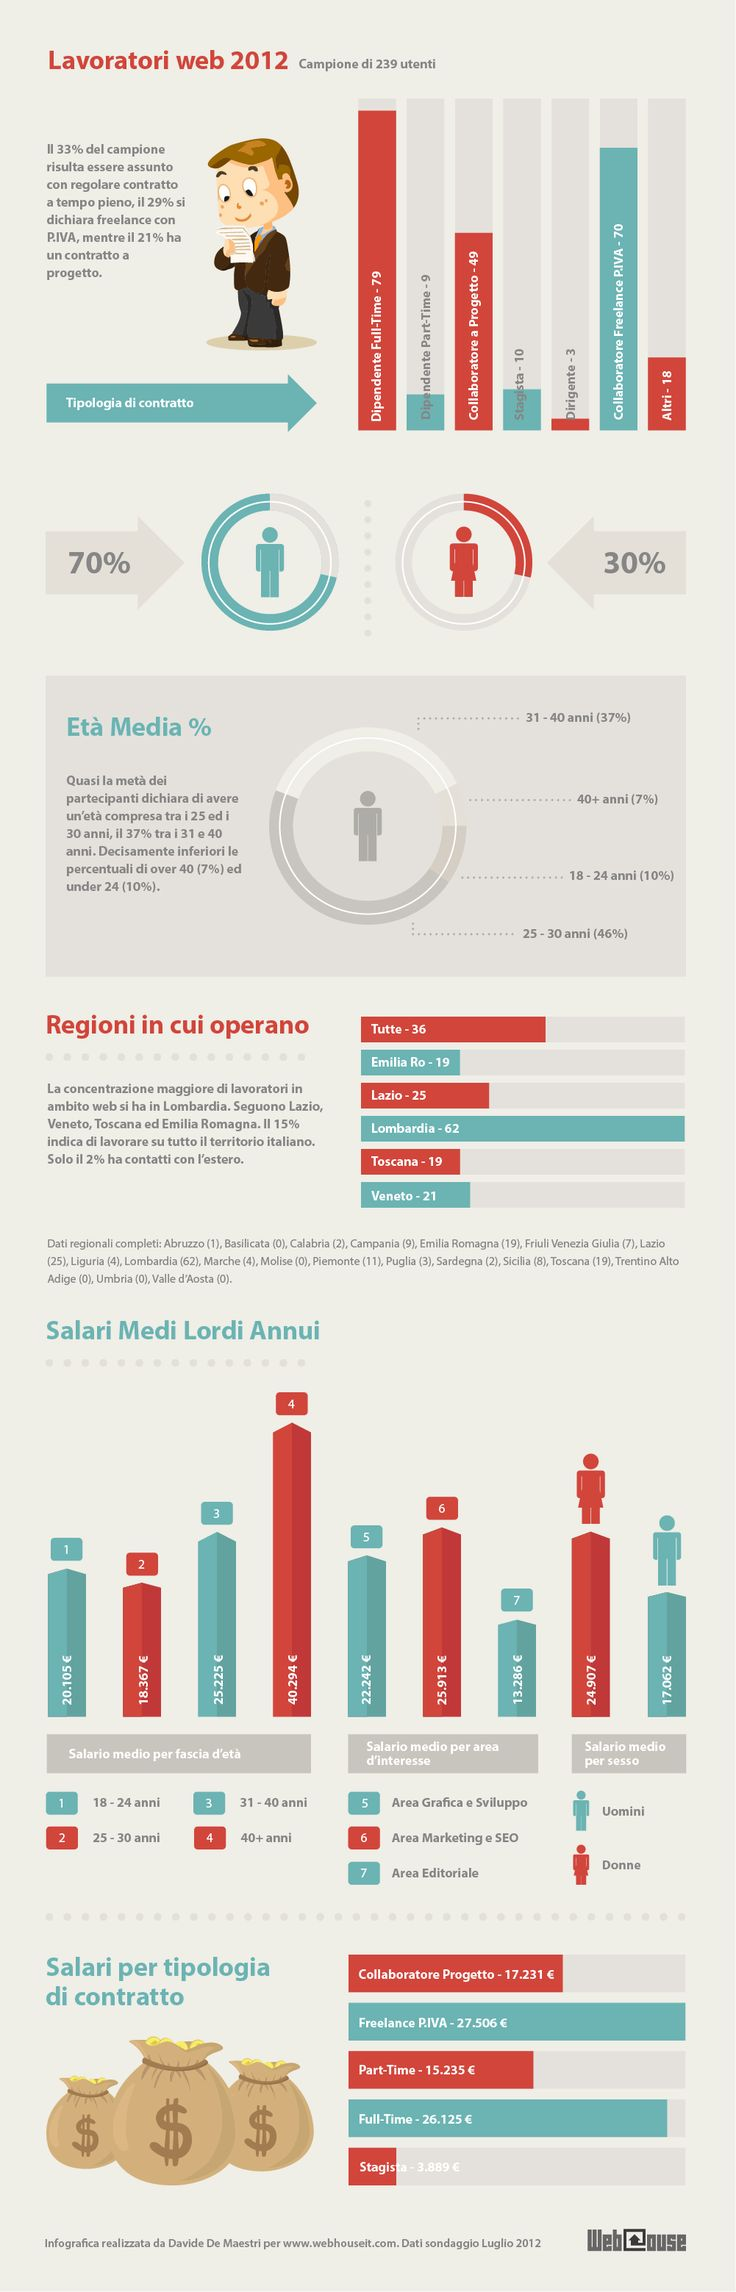 Infografica #Salari Lavoratori #Web 2012